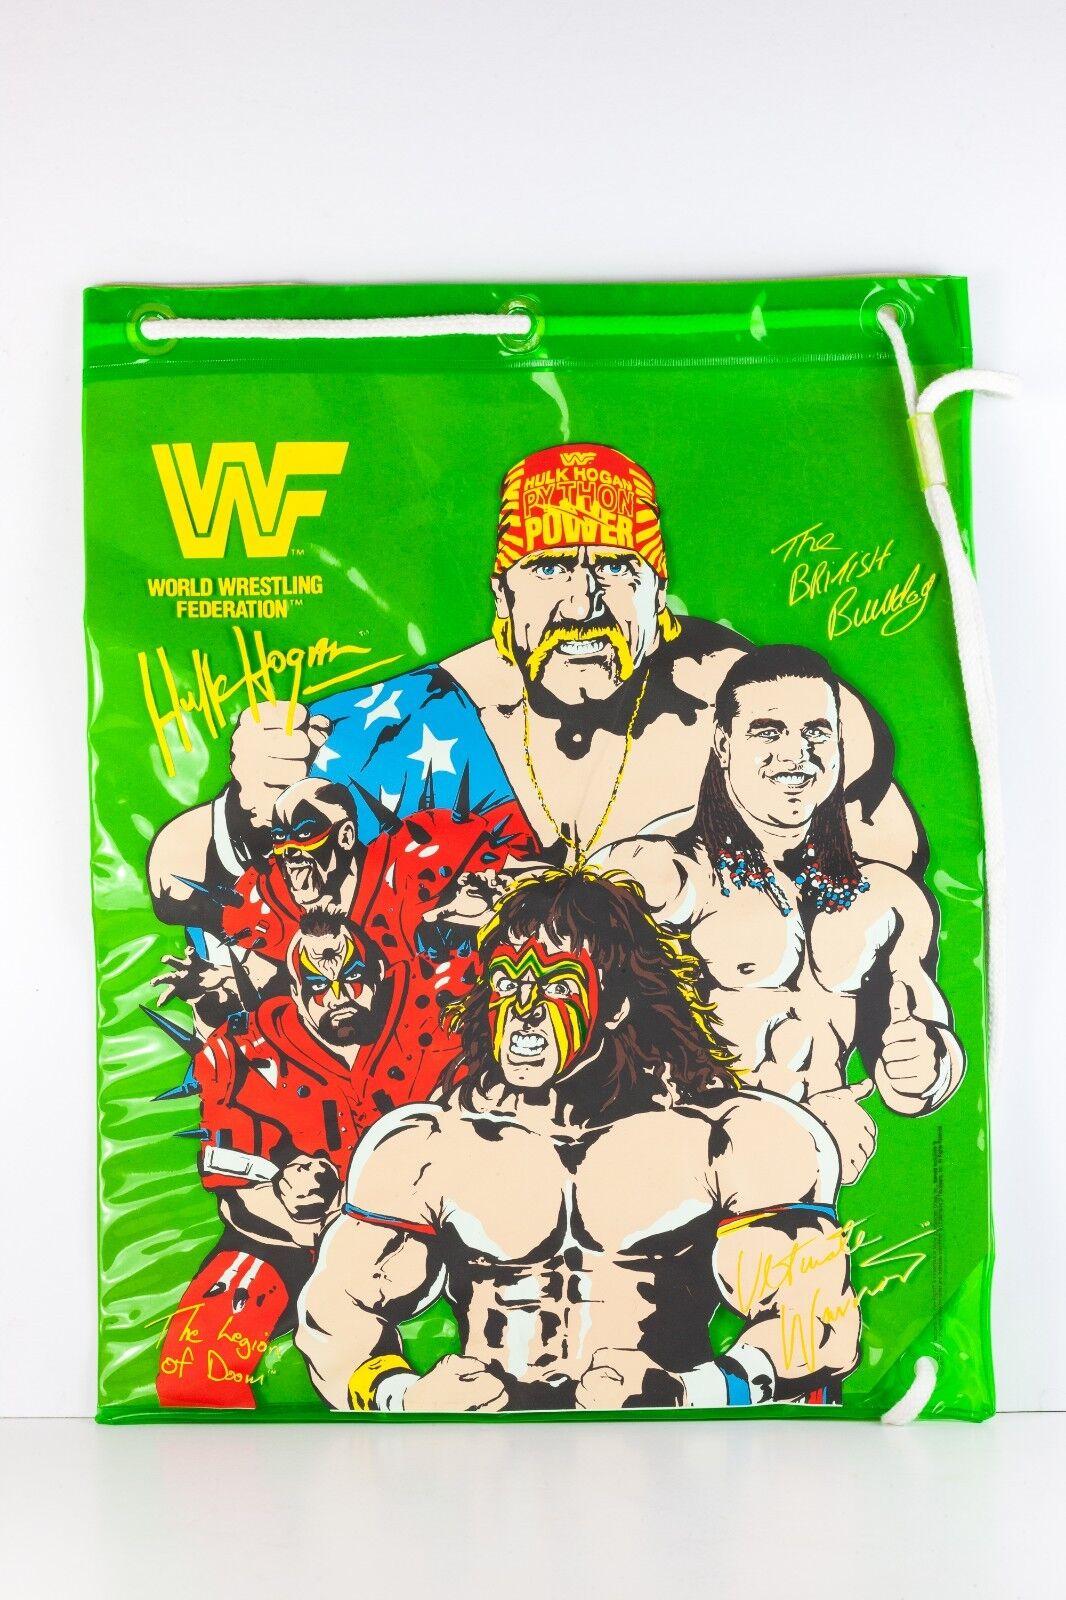 WWF Hulk Hogan Wrestling recuerdos Bolsa Vintage Marvel 1991 TitanDeporte 17